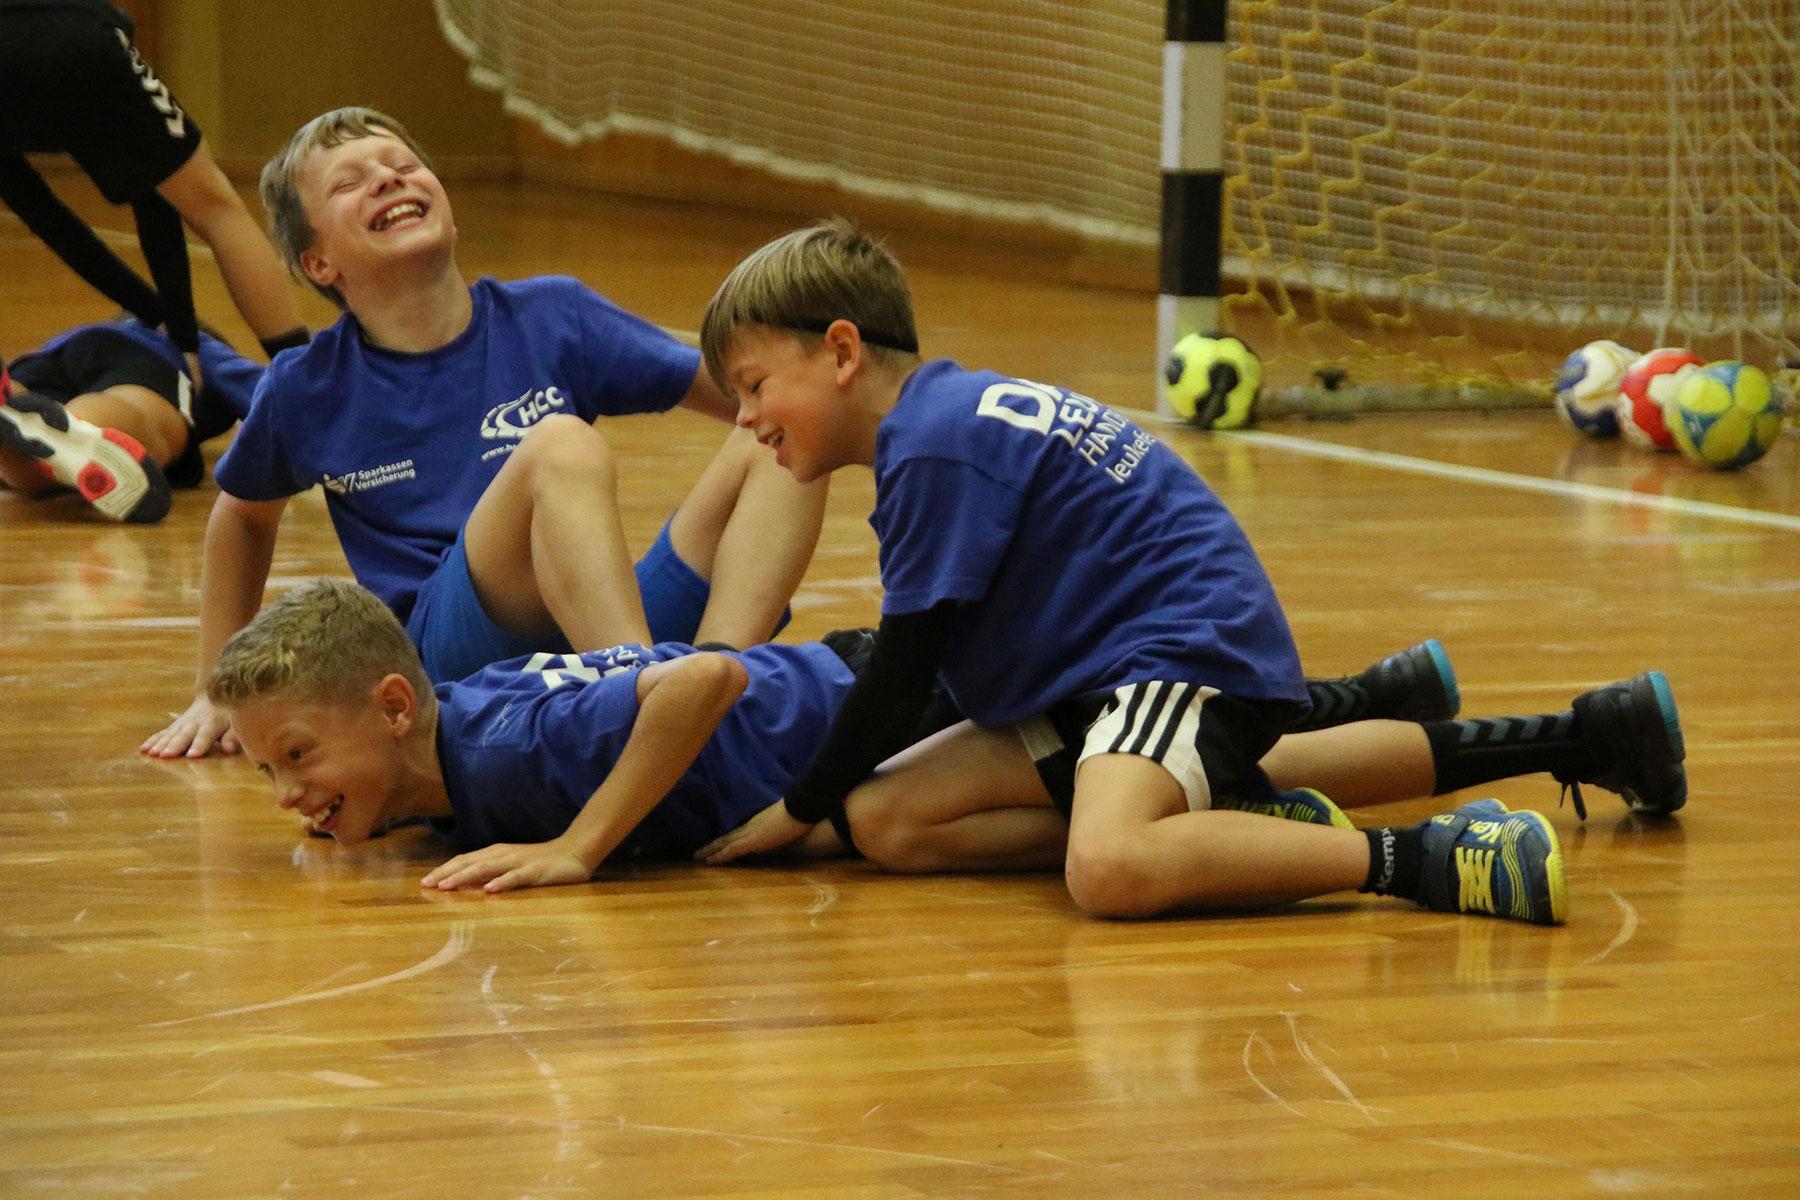 201809_Handballcamp_NDH (62)